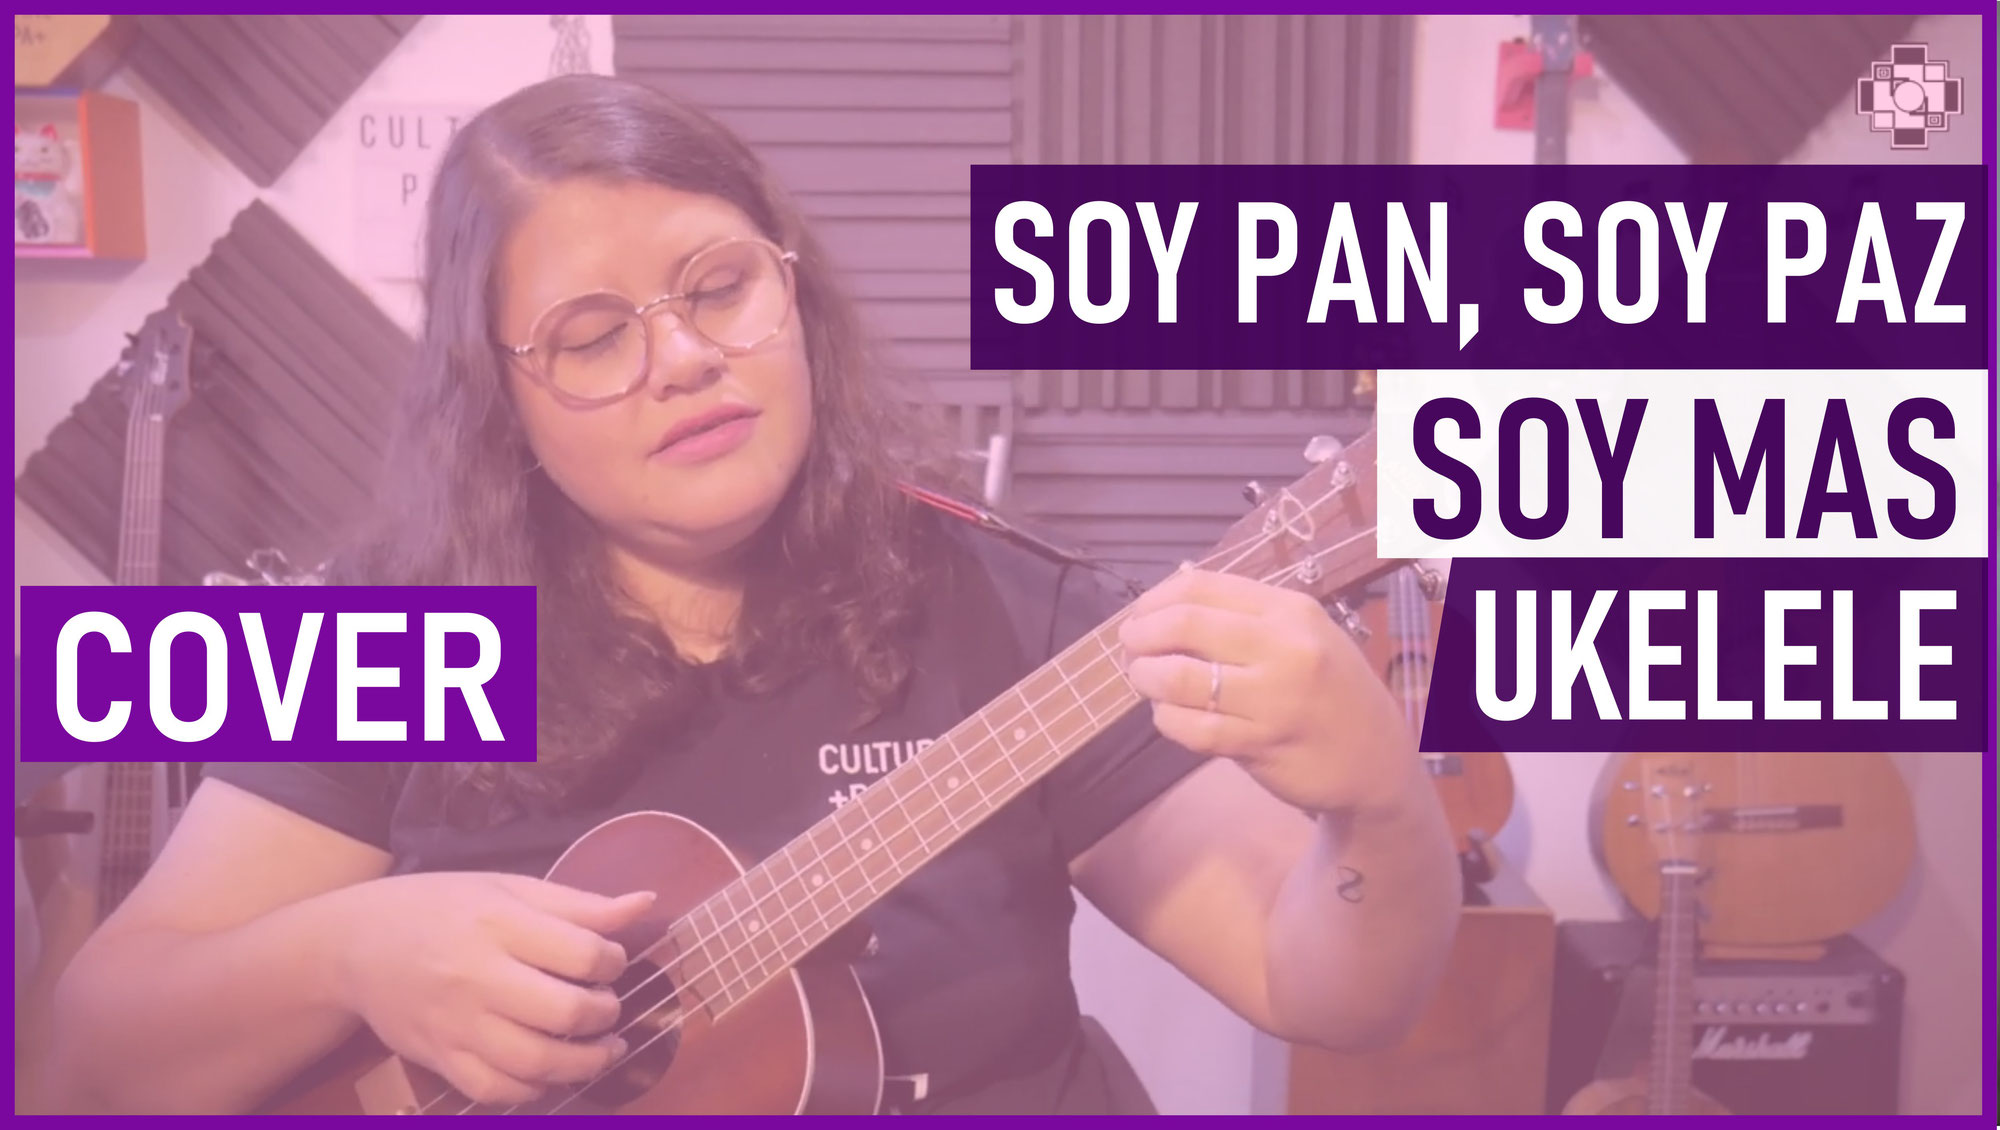 Soy Pan Soy Paz Soy Mas (Piero - Mercedes Sosa) | Ukelele Cover